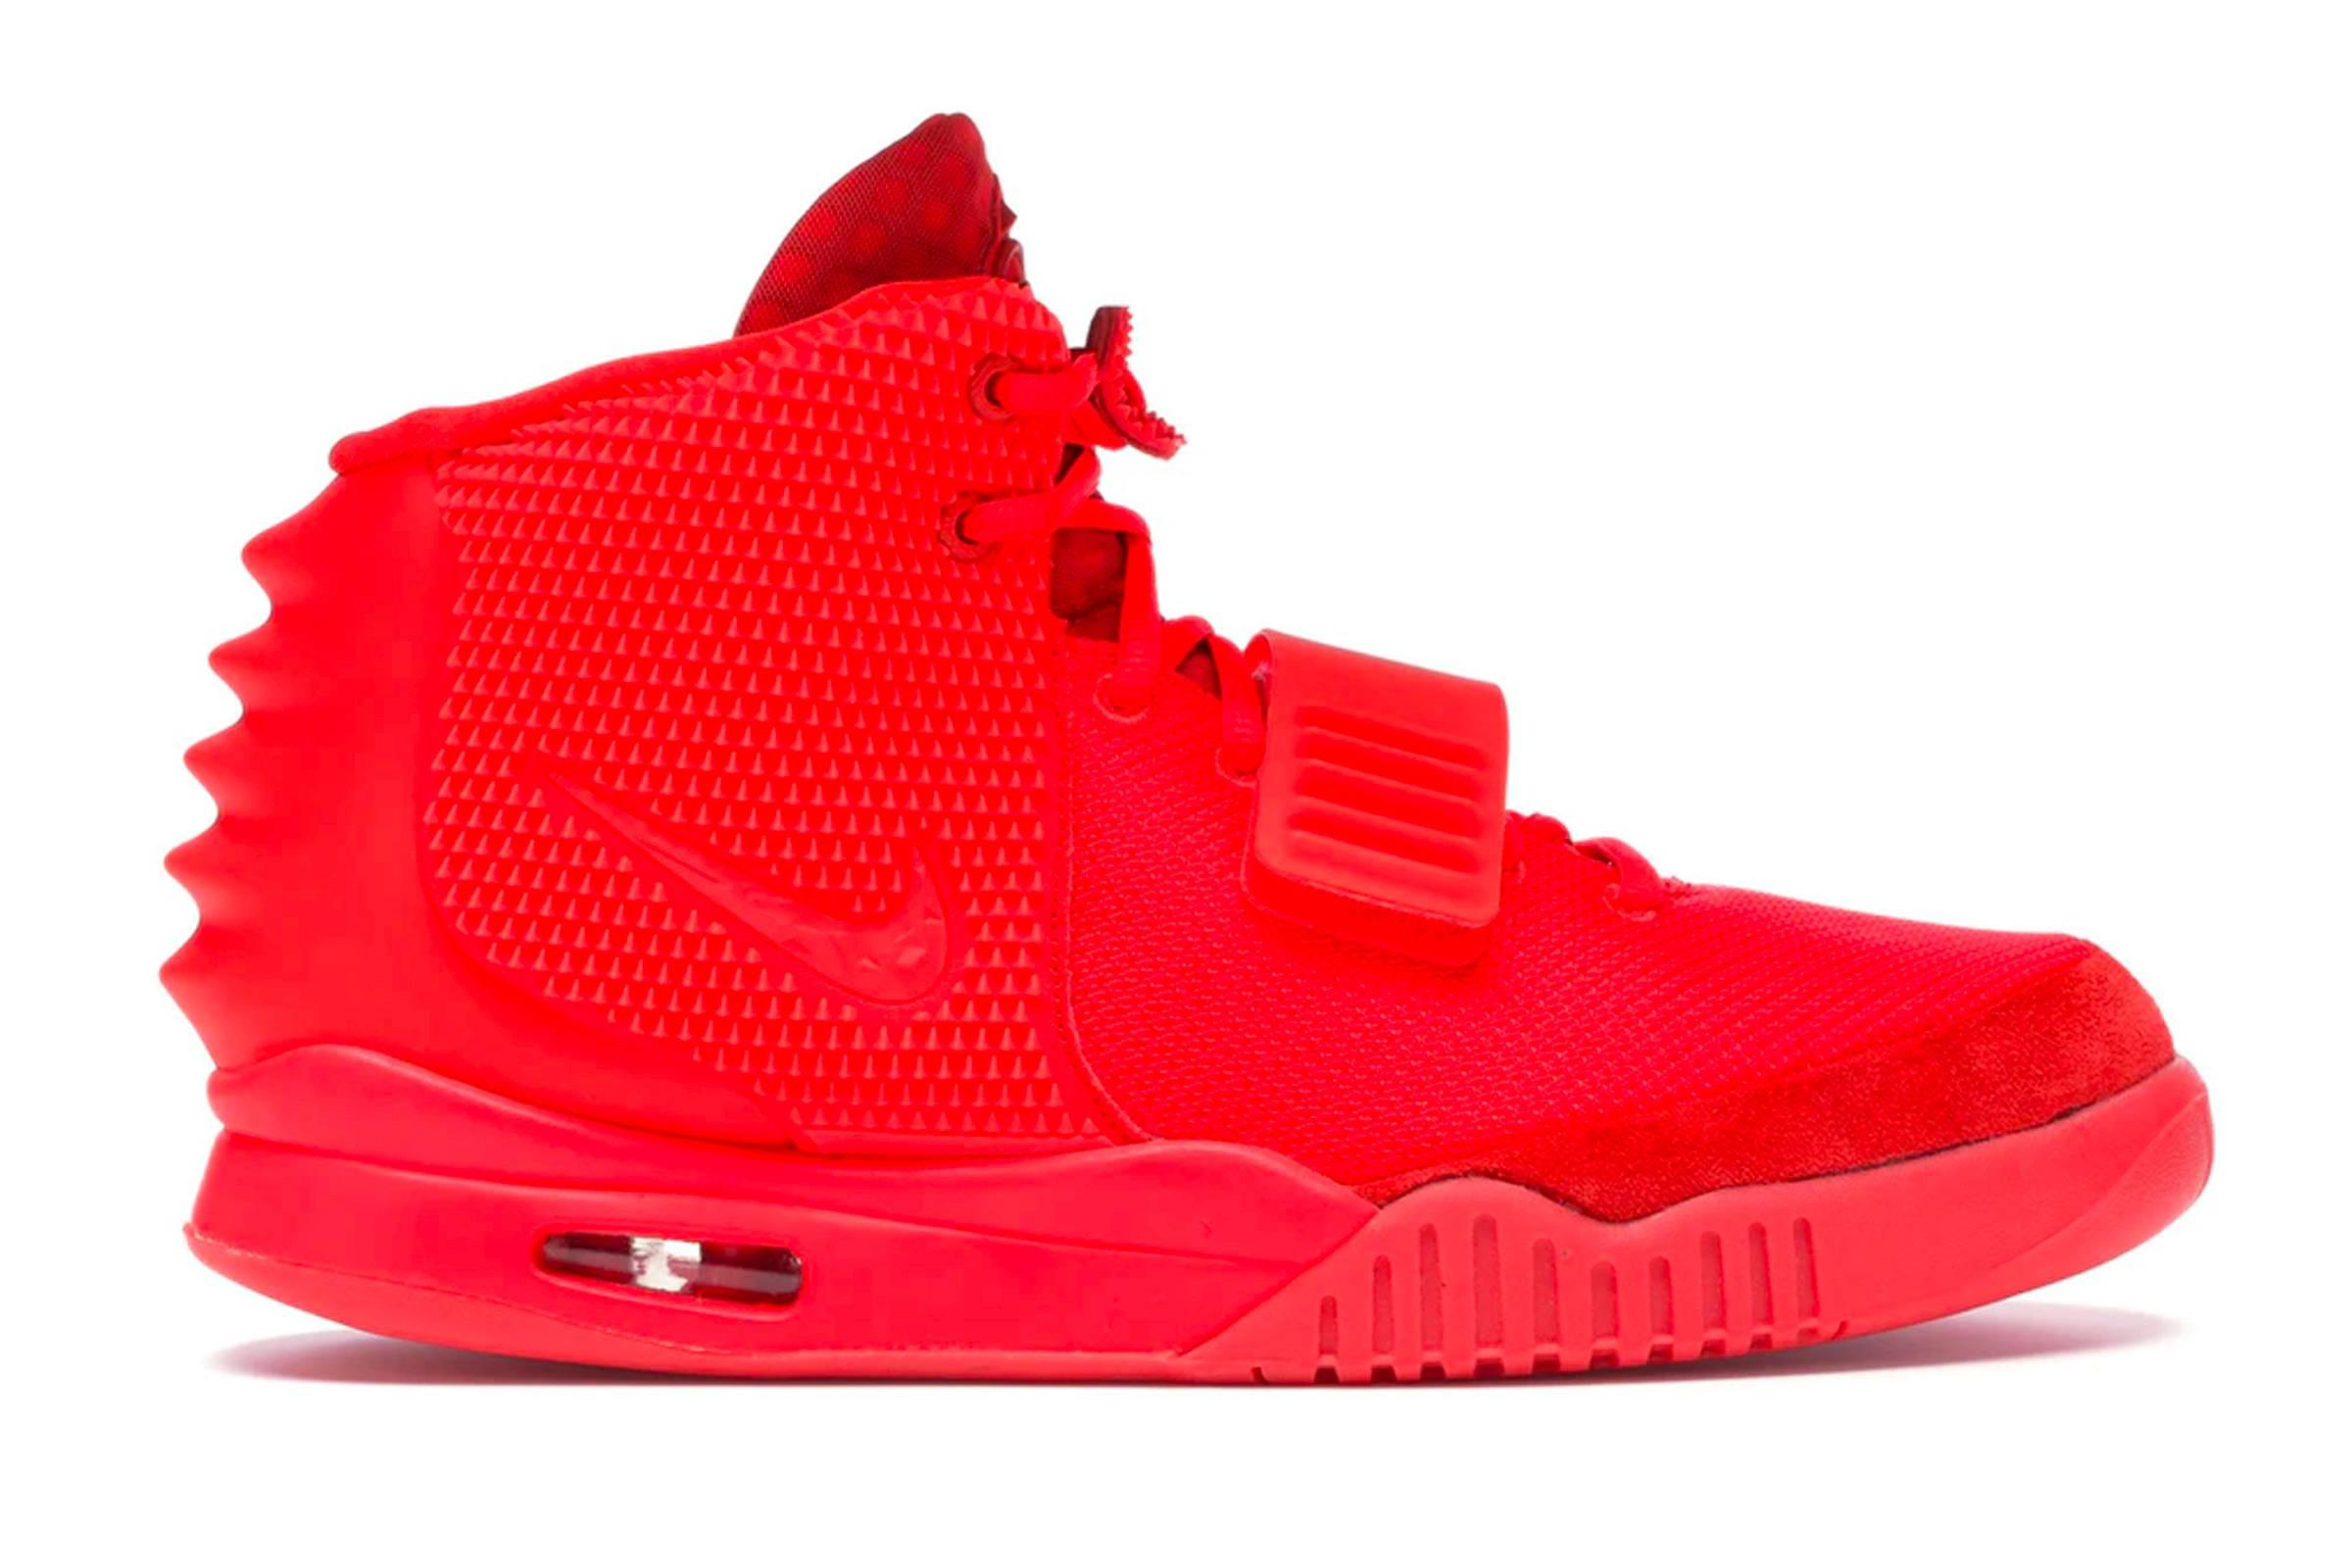 Nike Air Yeezy 2 (2012-2014)